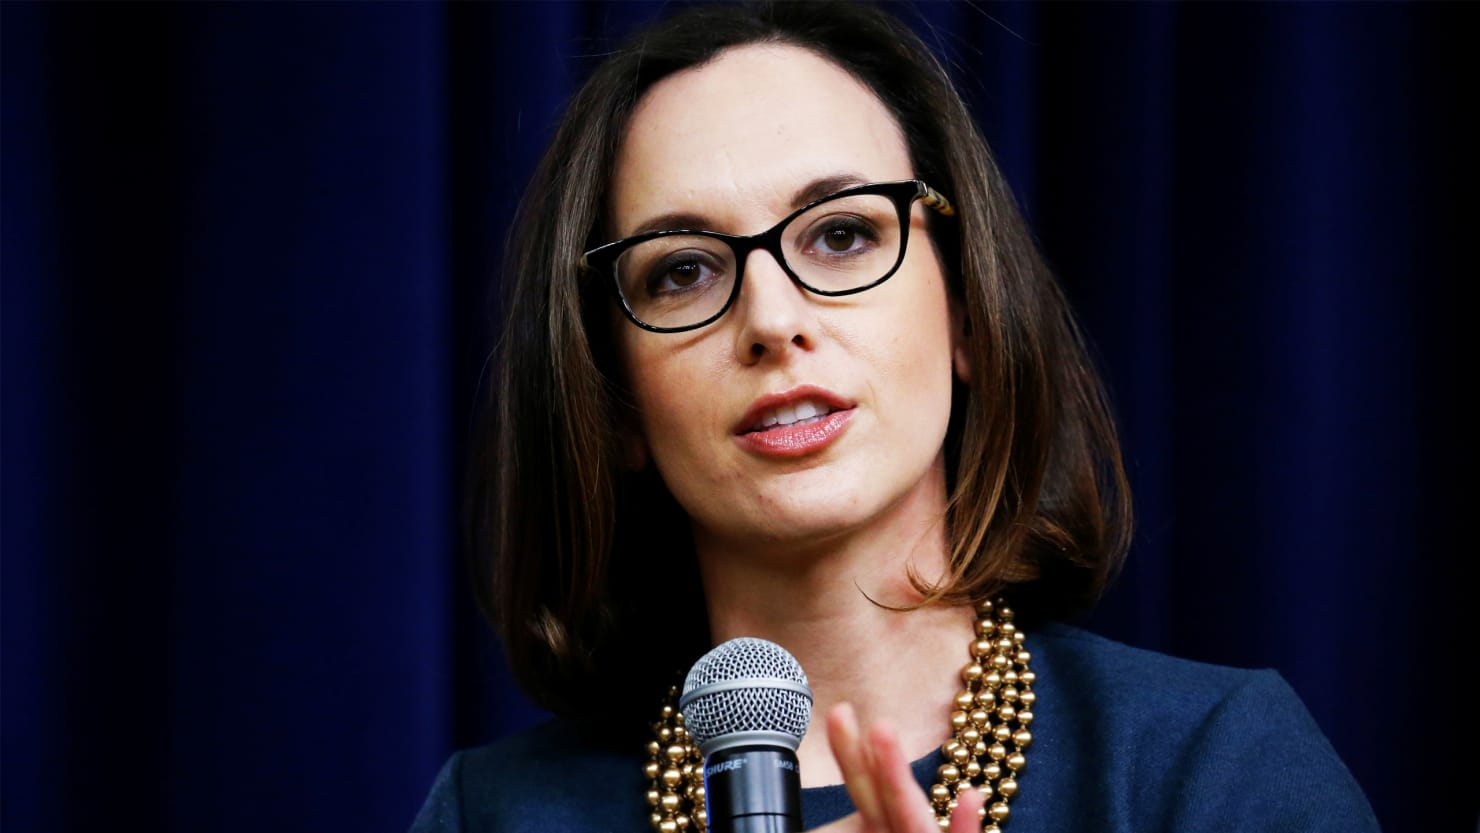 Kerri Kupec Replaces Sessions Ally as Top DOJ Spokeswoman